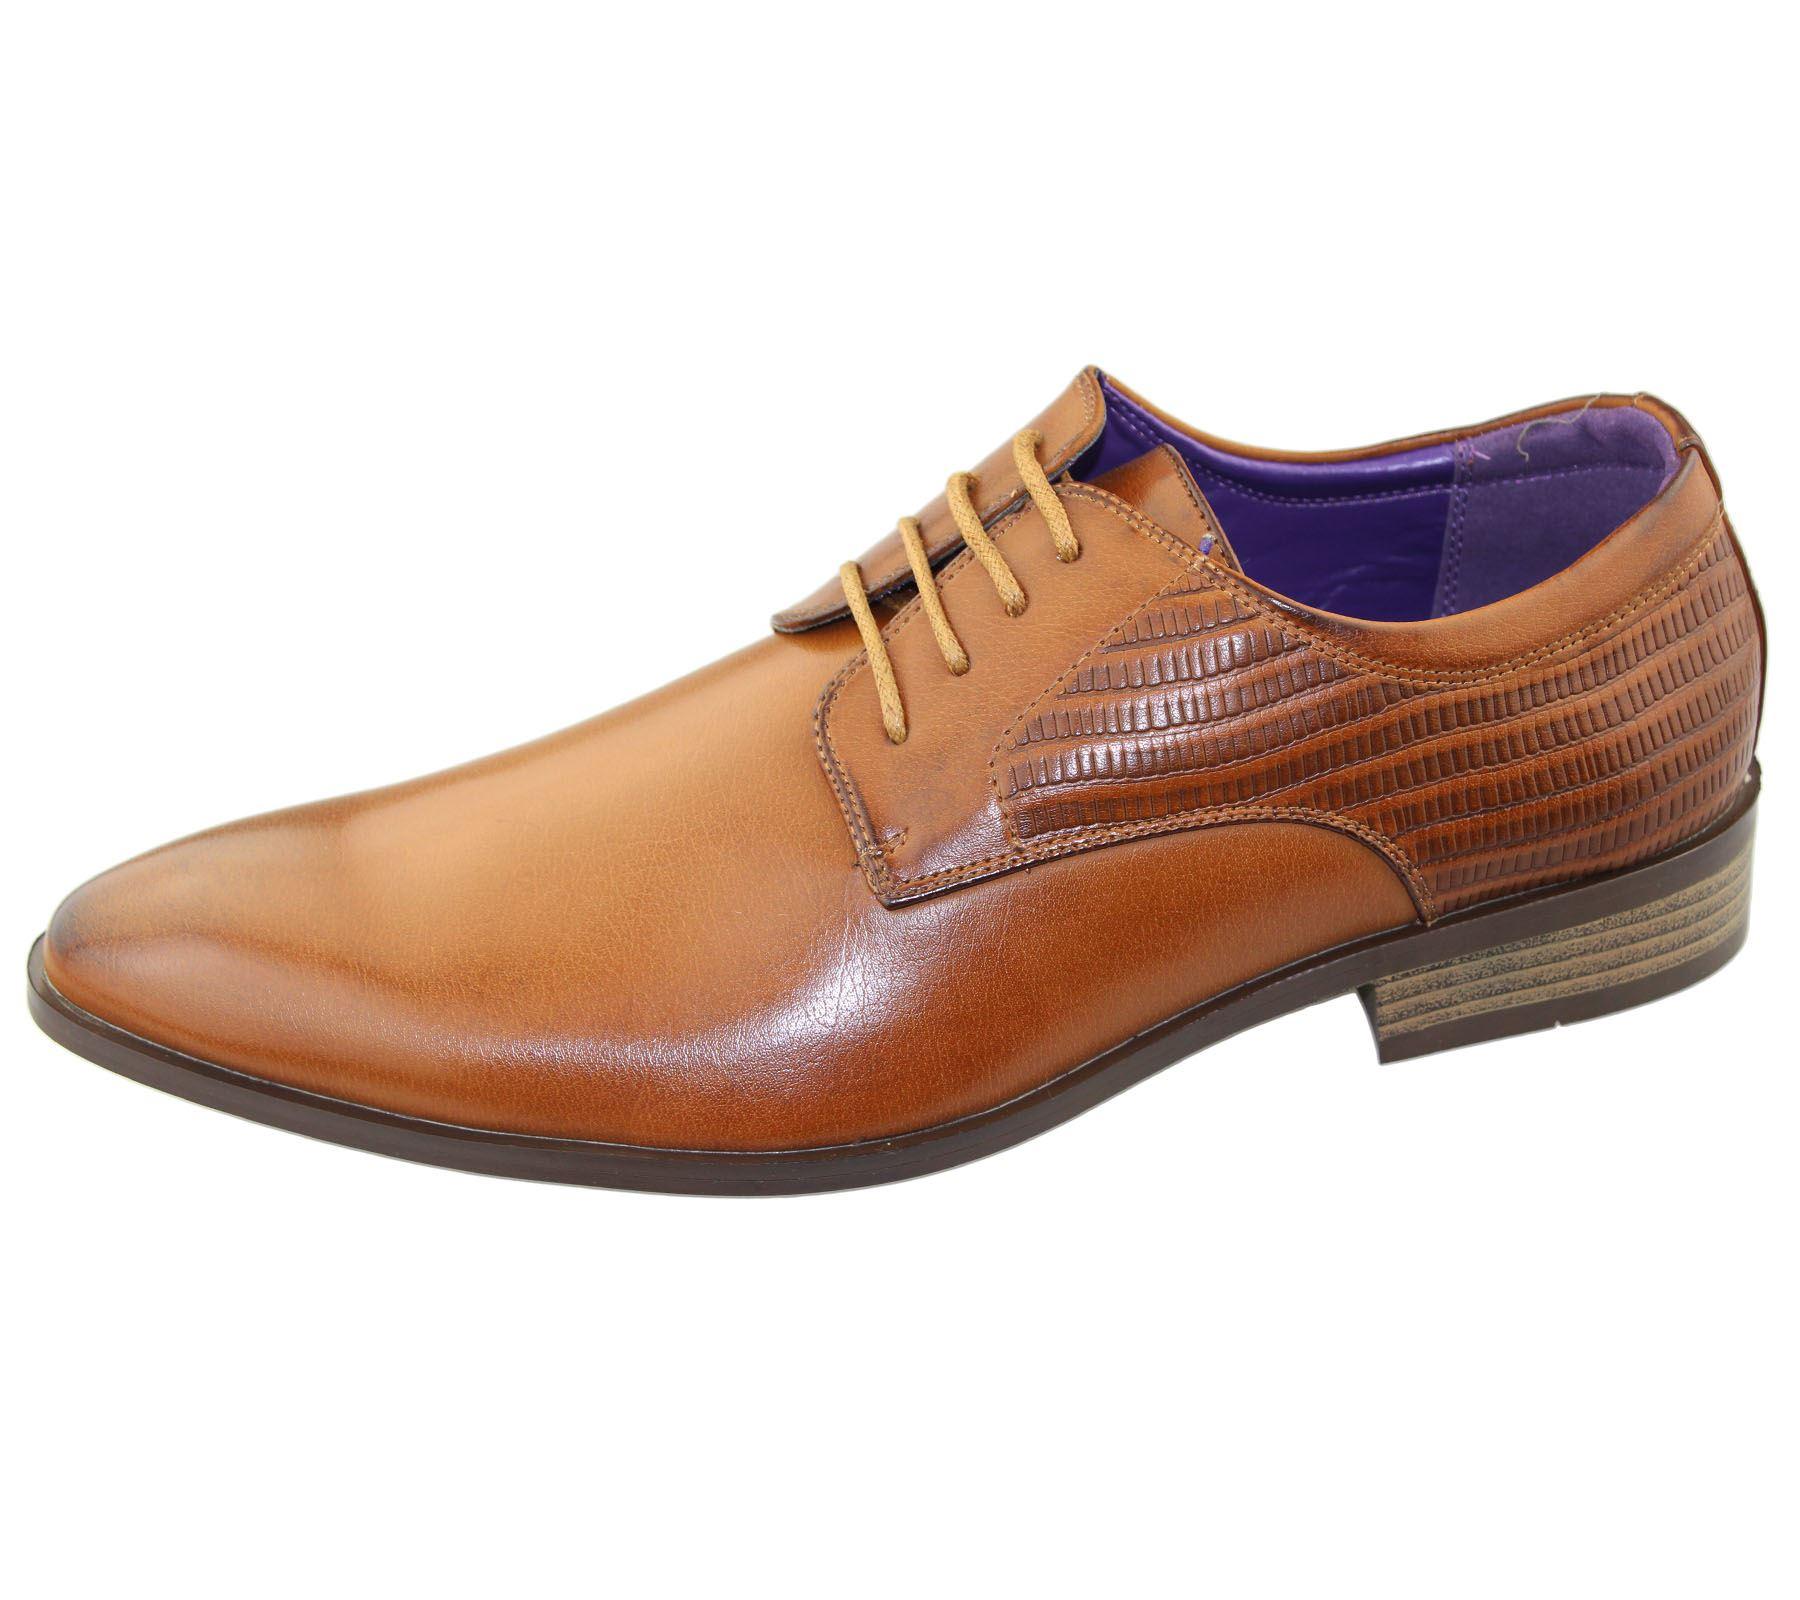 Casual Wedding Shoes 032 - Casual Wedding Shoes